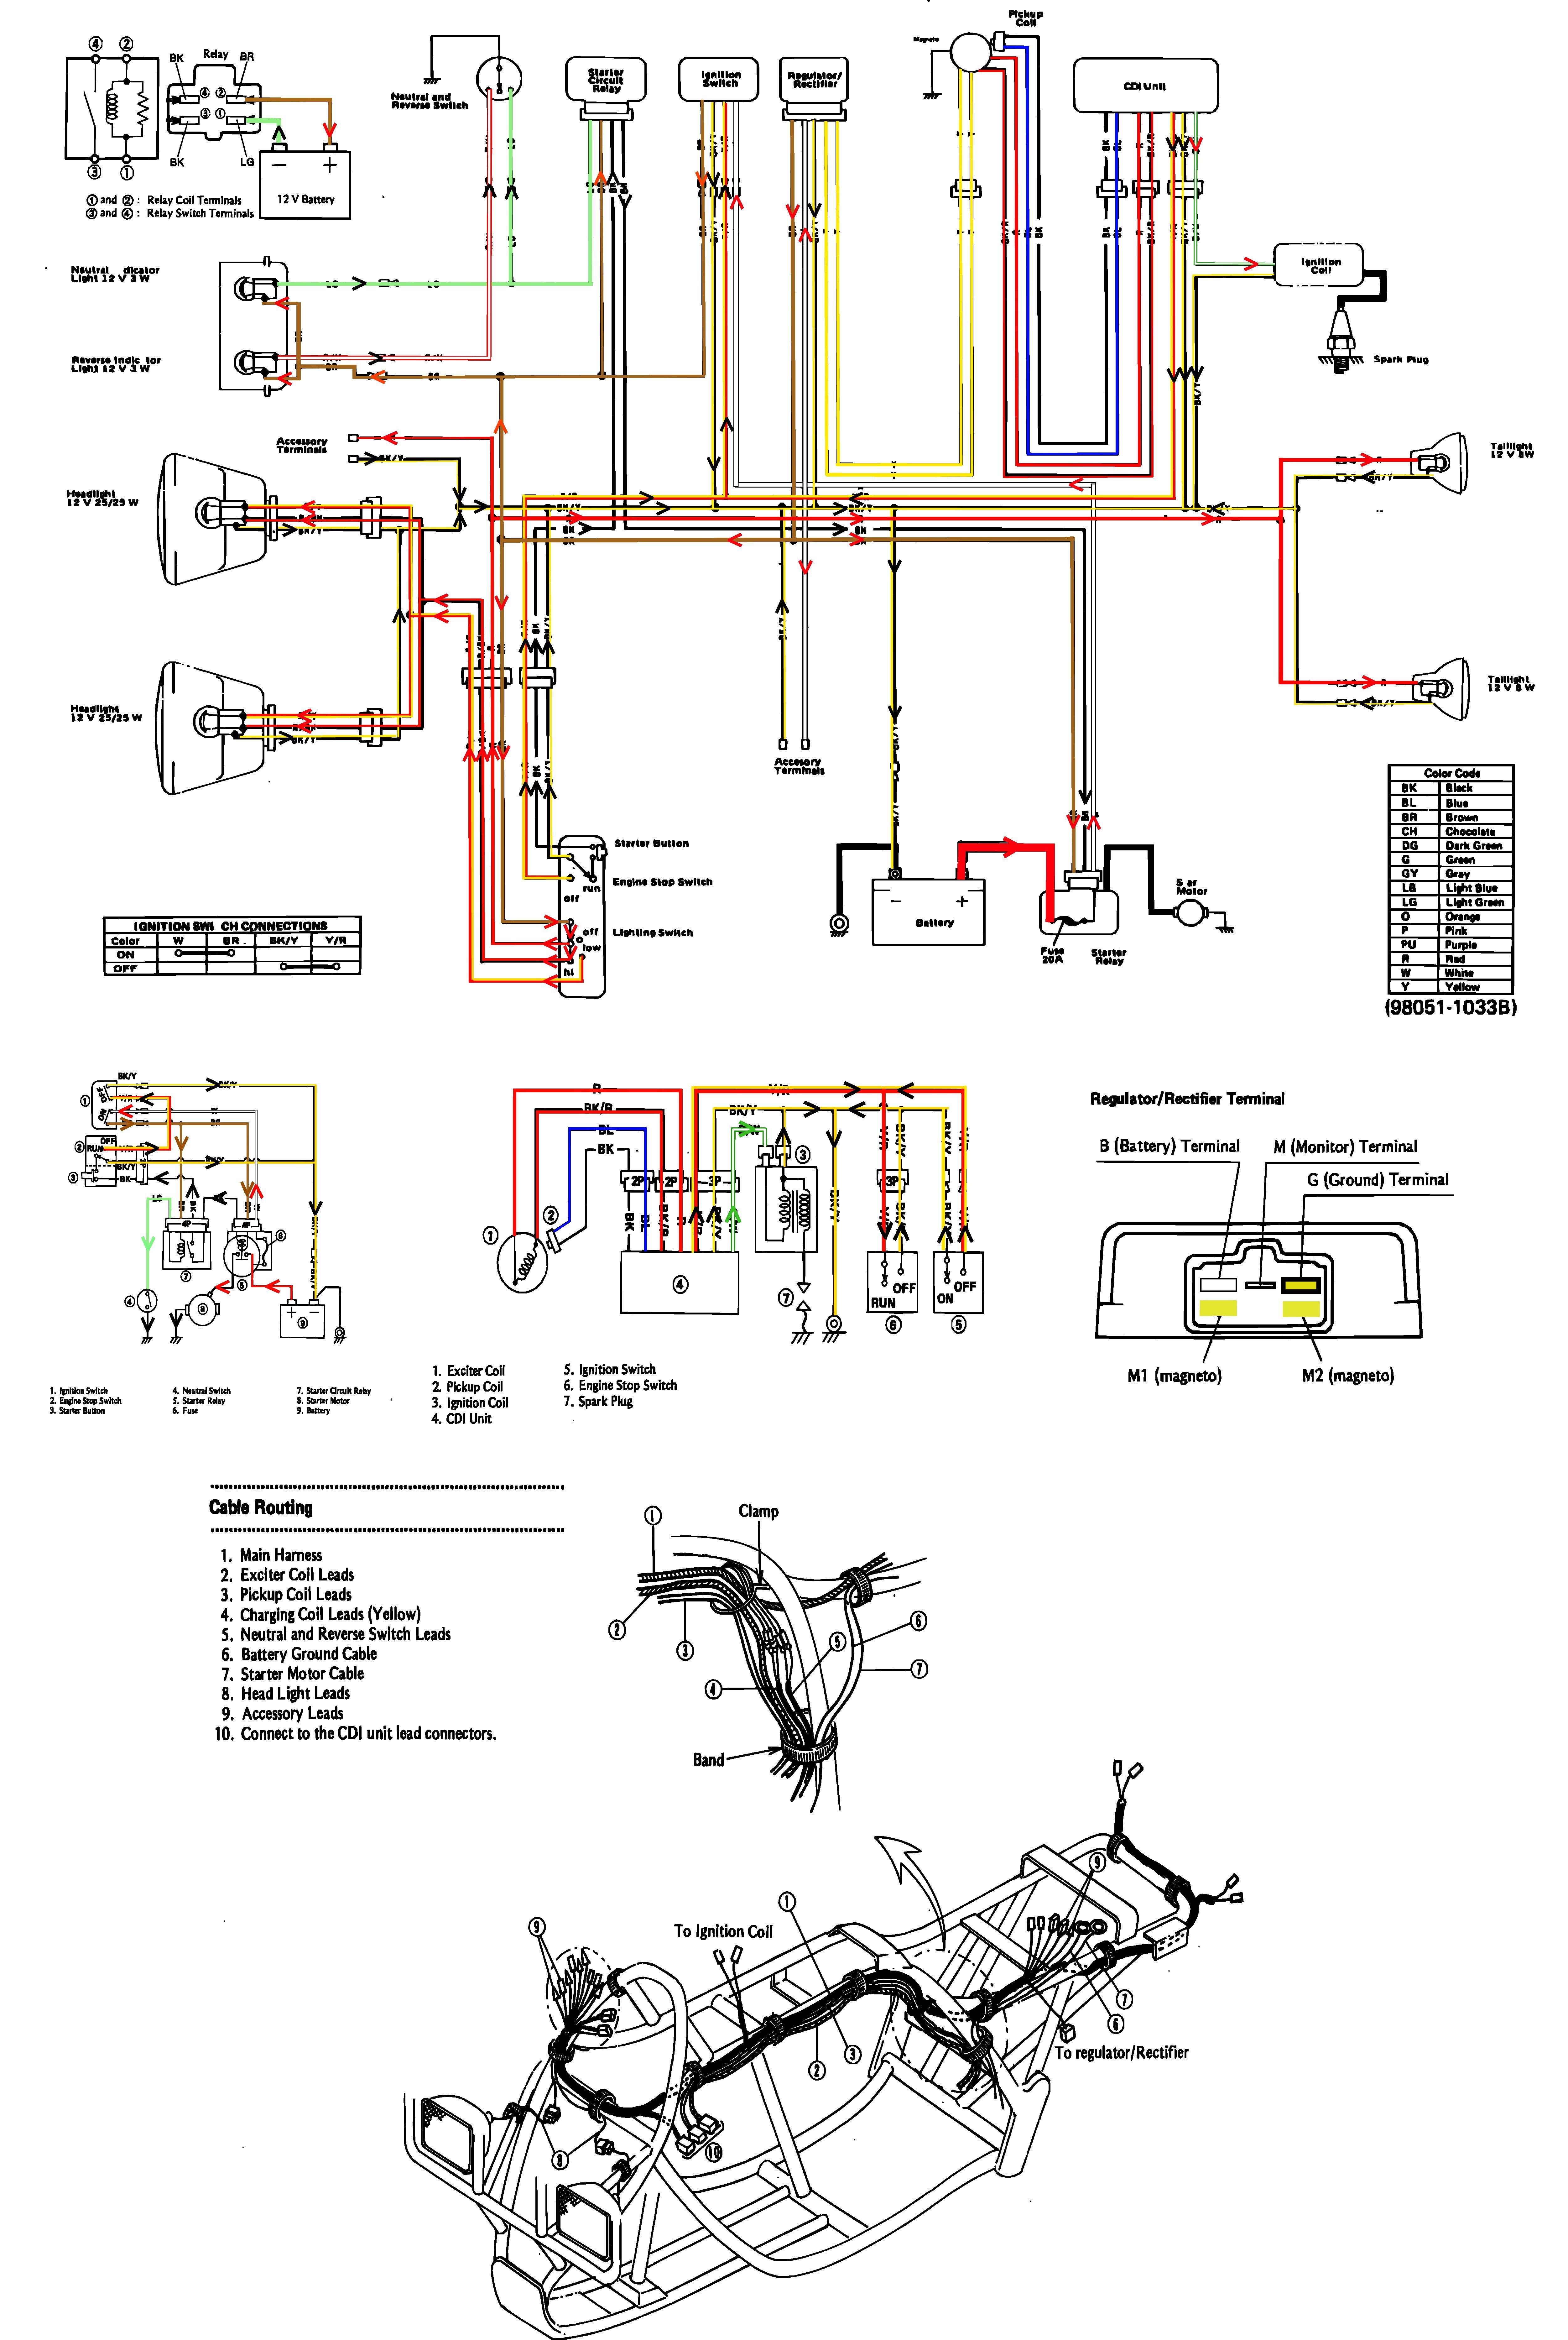 kawasaki klf220 wiring diagram hotpoint dishwasher 1988 a1 bayou atvs pinterest